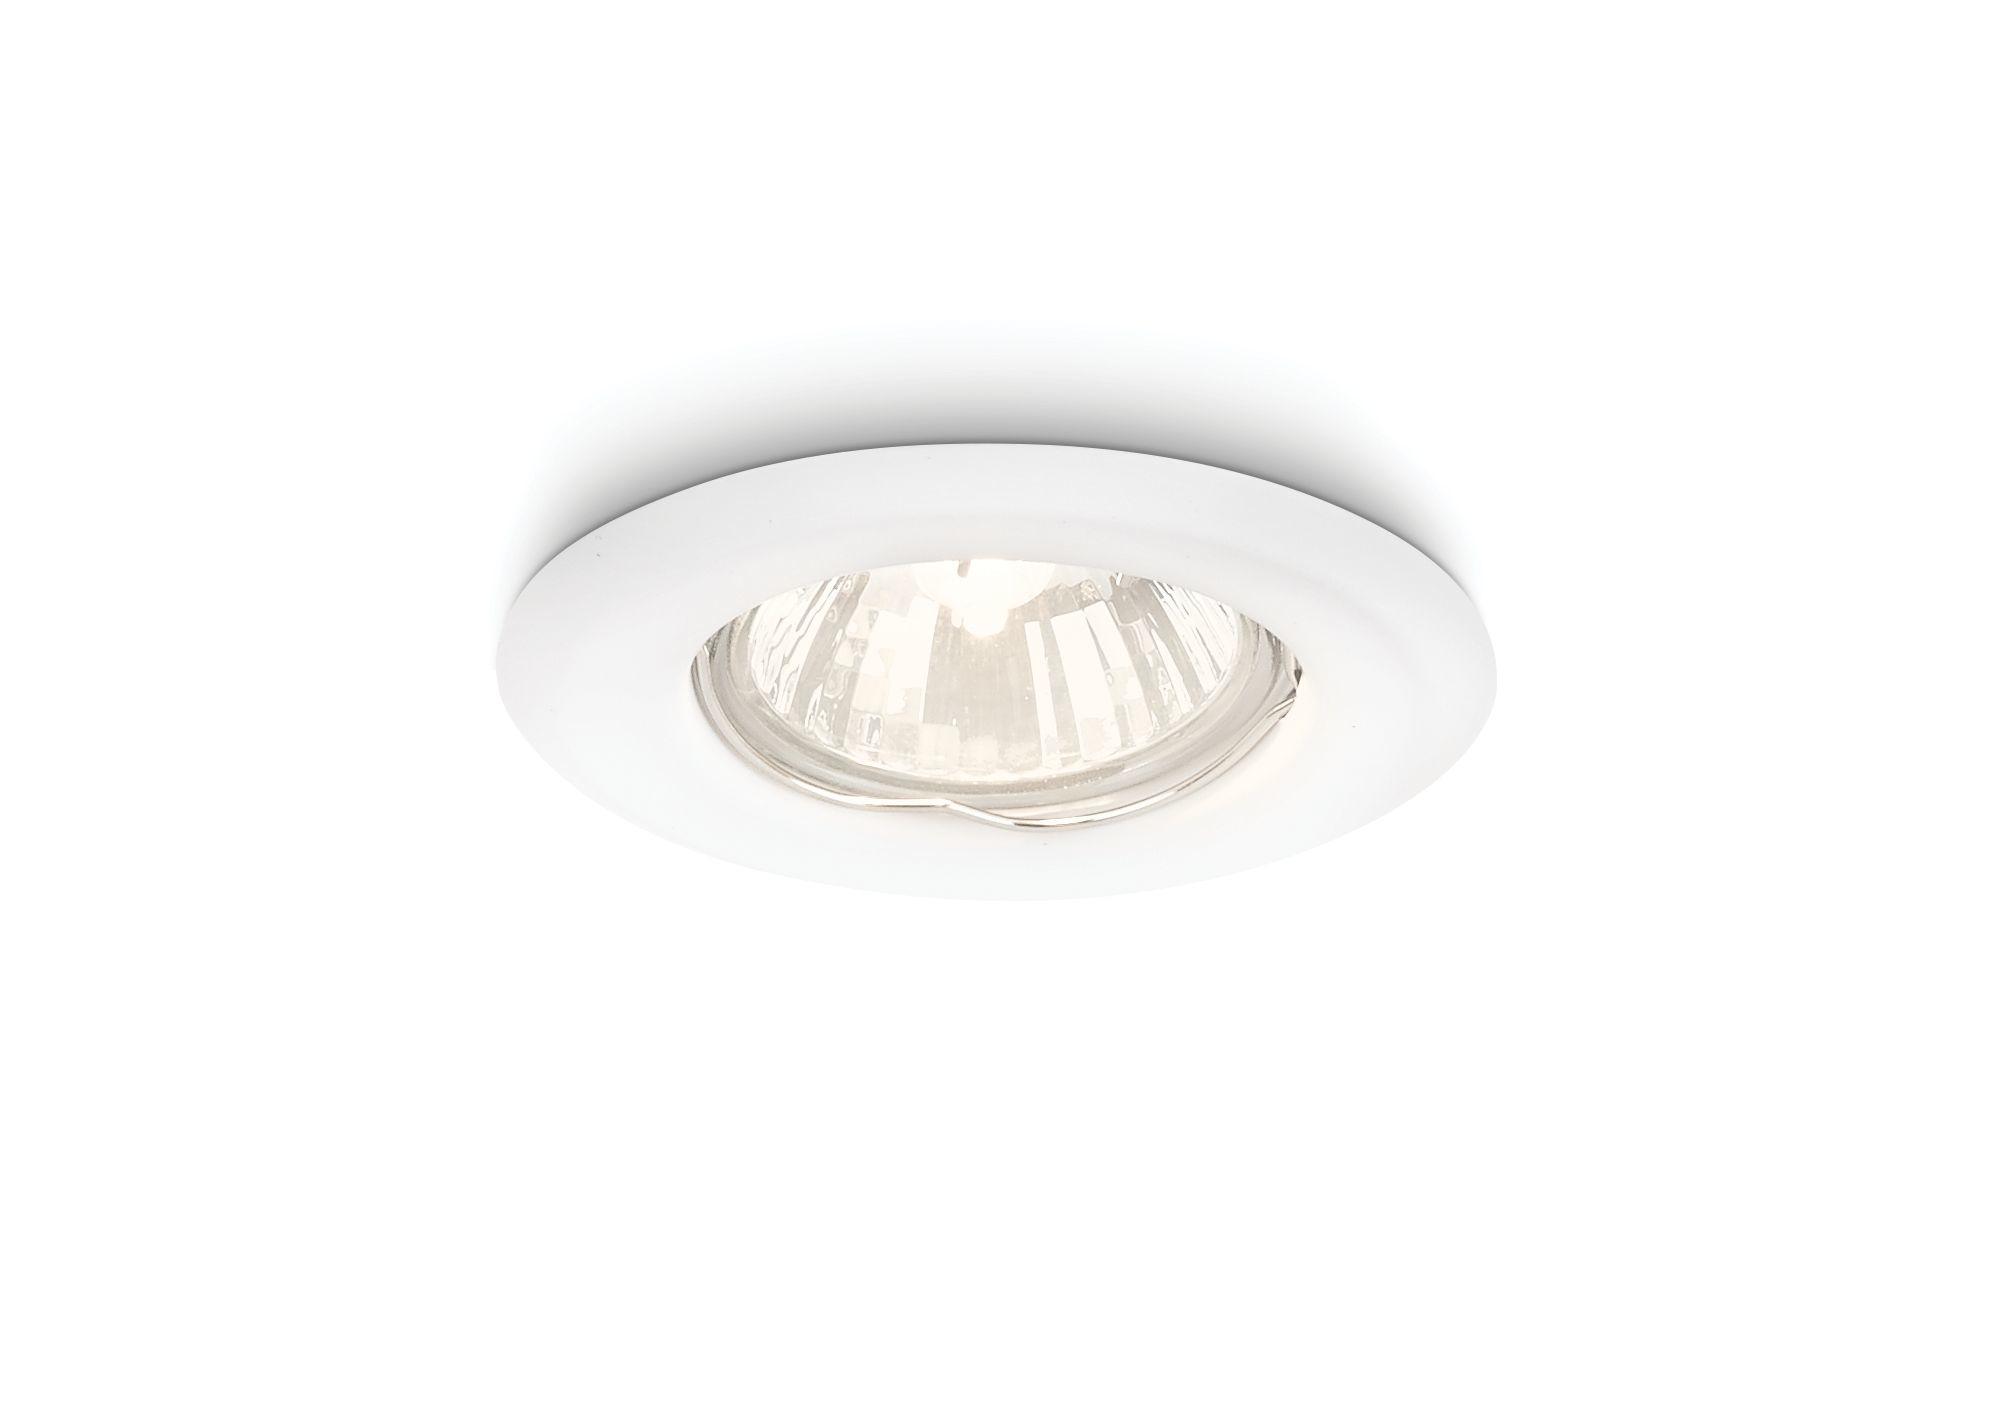 Philips Lighting - Enif attacco GU10 230v - 59230/31/e7